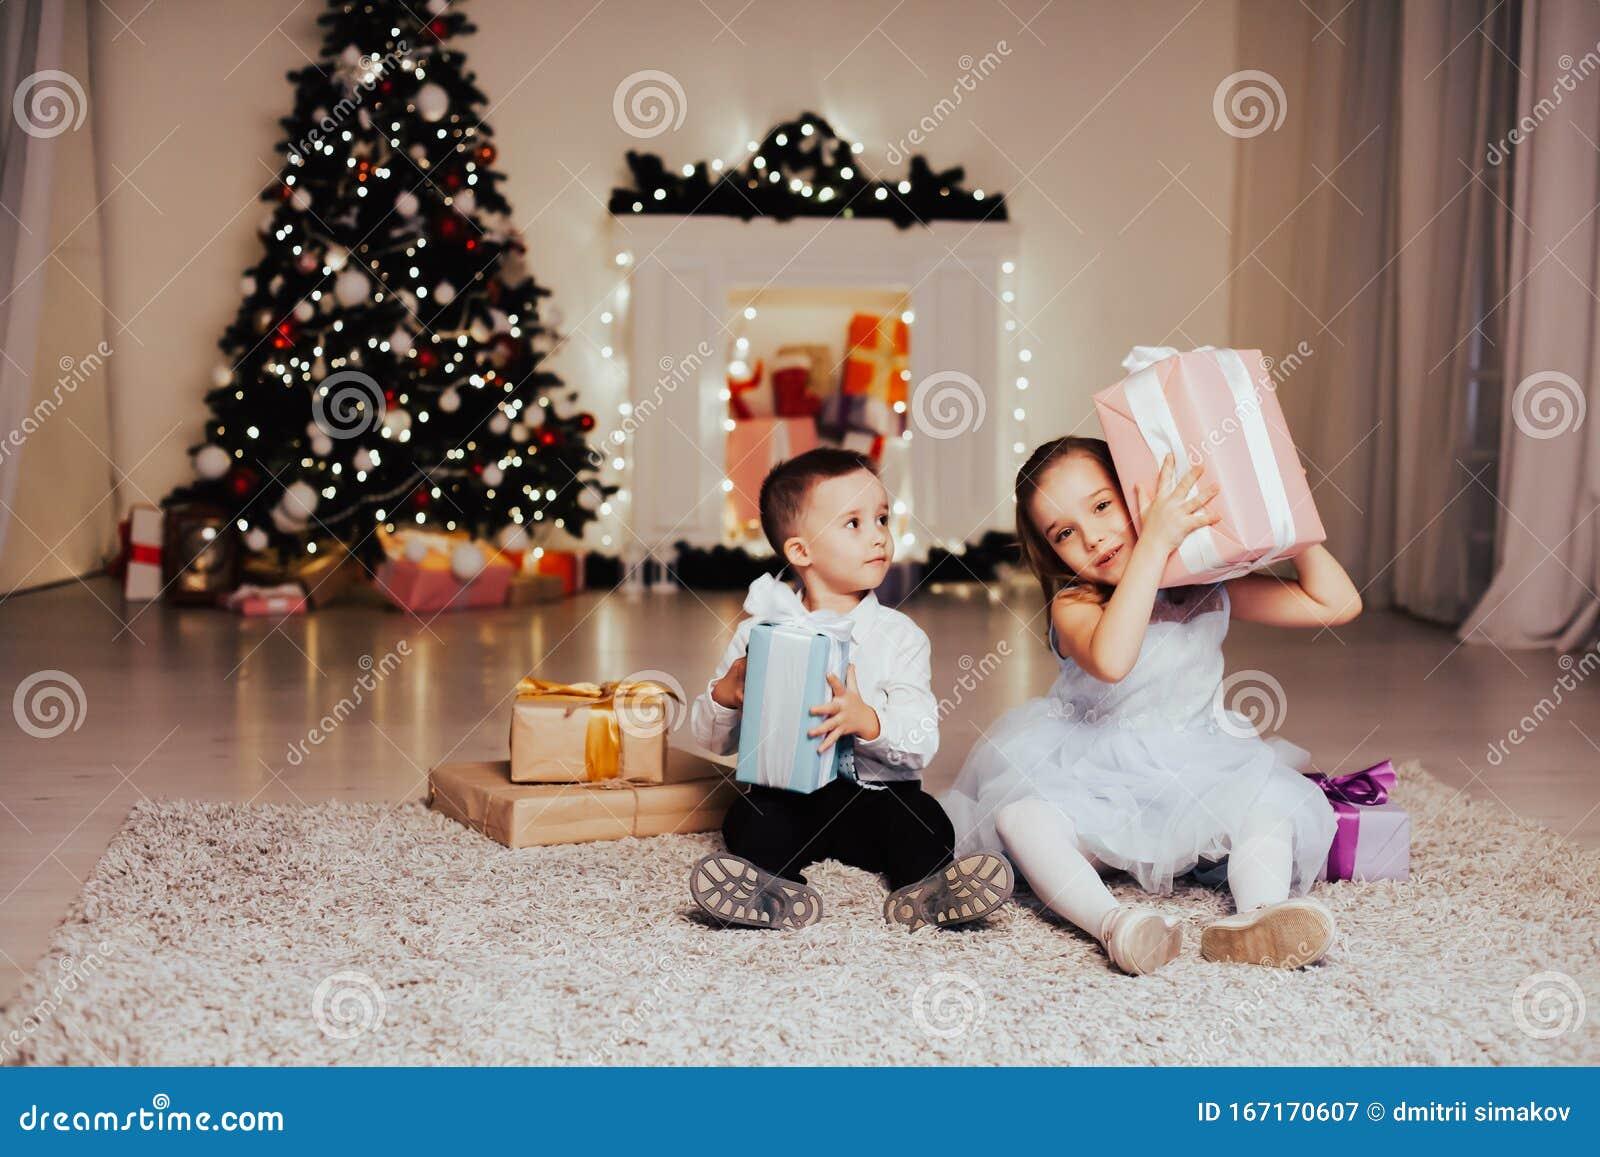 Open Christmas Presents 2020 A Boy With A Girl Open Christmas Presents New Year Holiday Garland